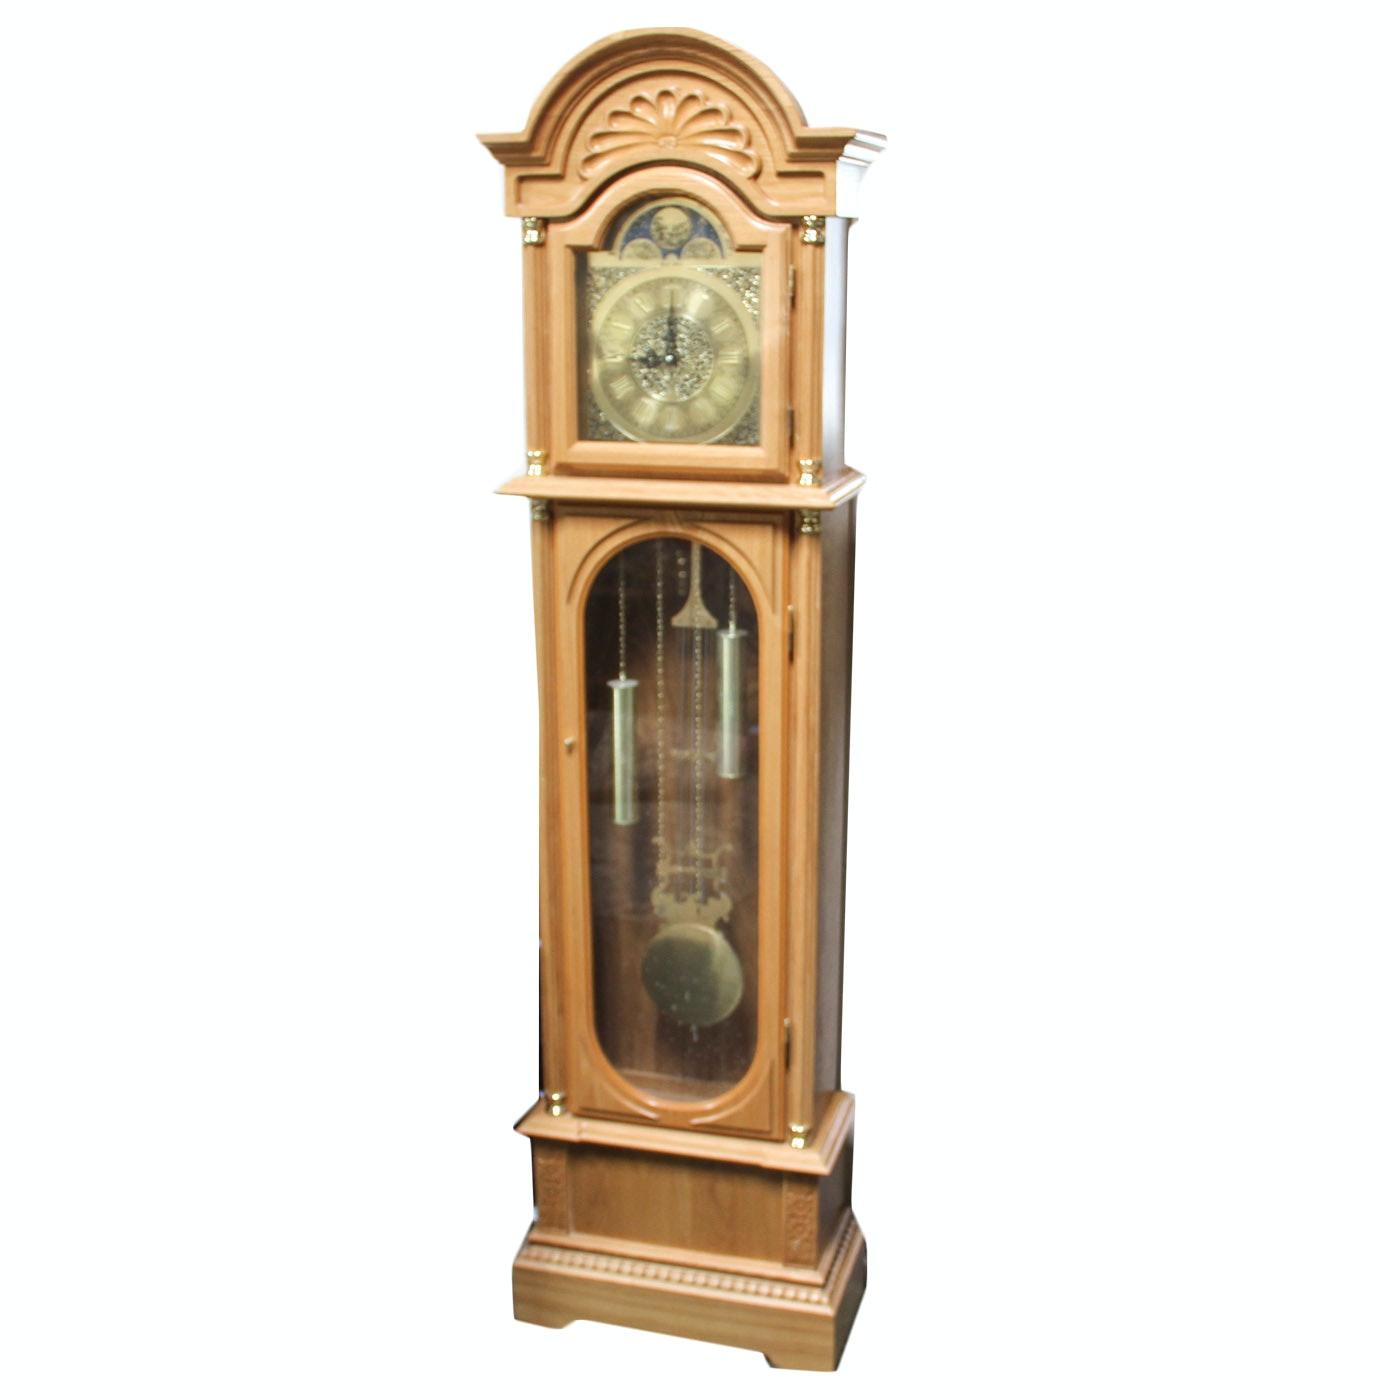 Vintage Daniel Dokota Grandfather Clock